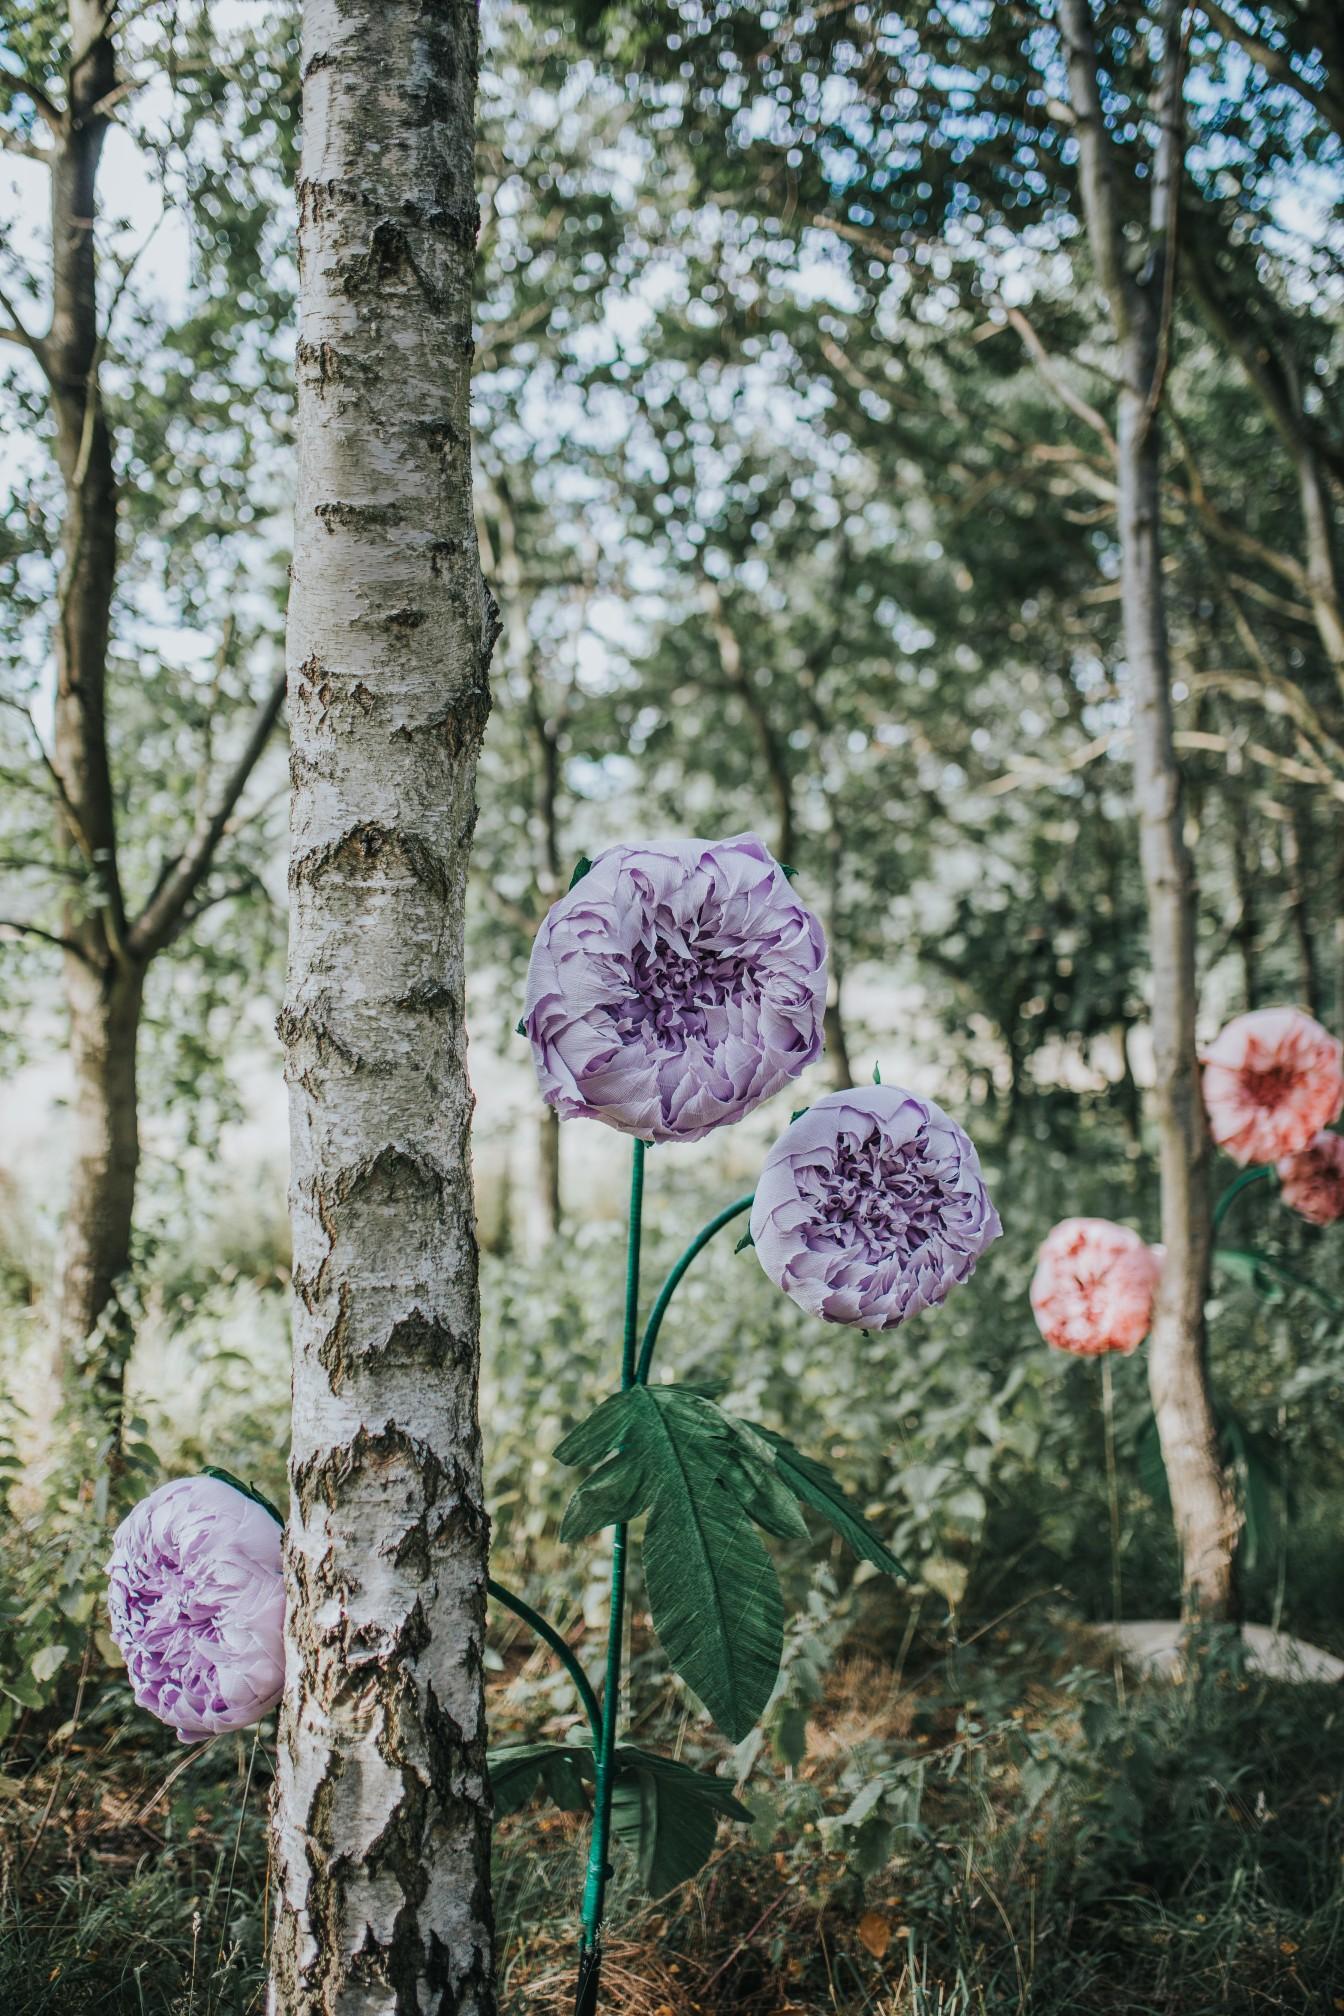 fairy wedding - whimsical wedding - magical wedding - elegant wedding dress - wedding paper flowers - outdoor wedding decor